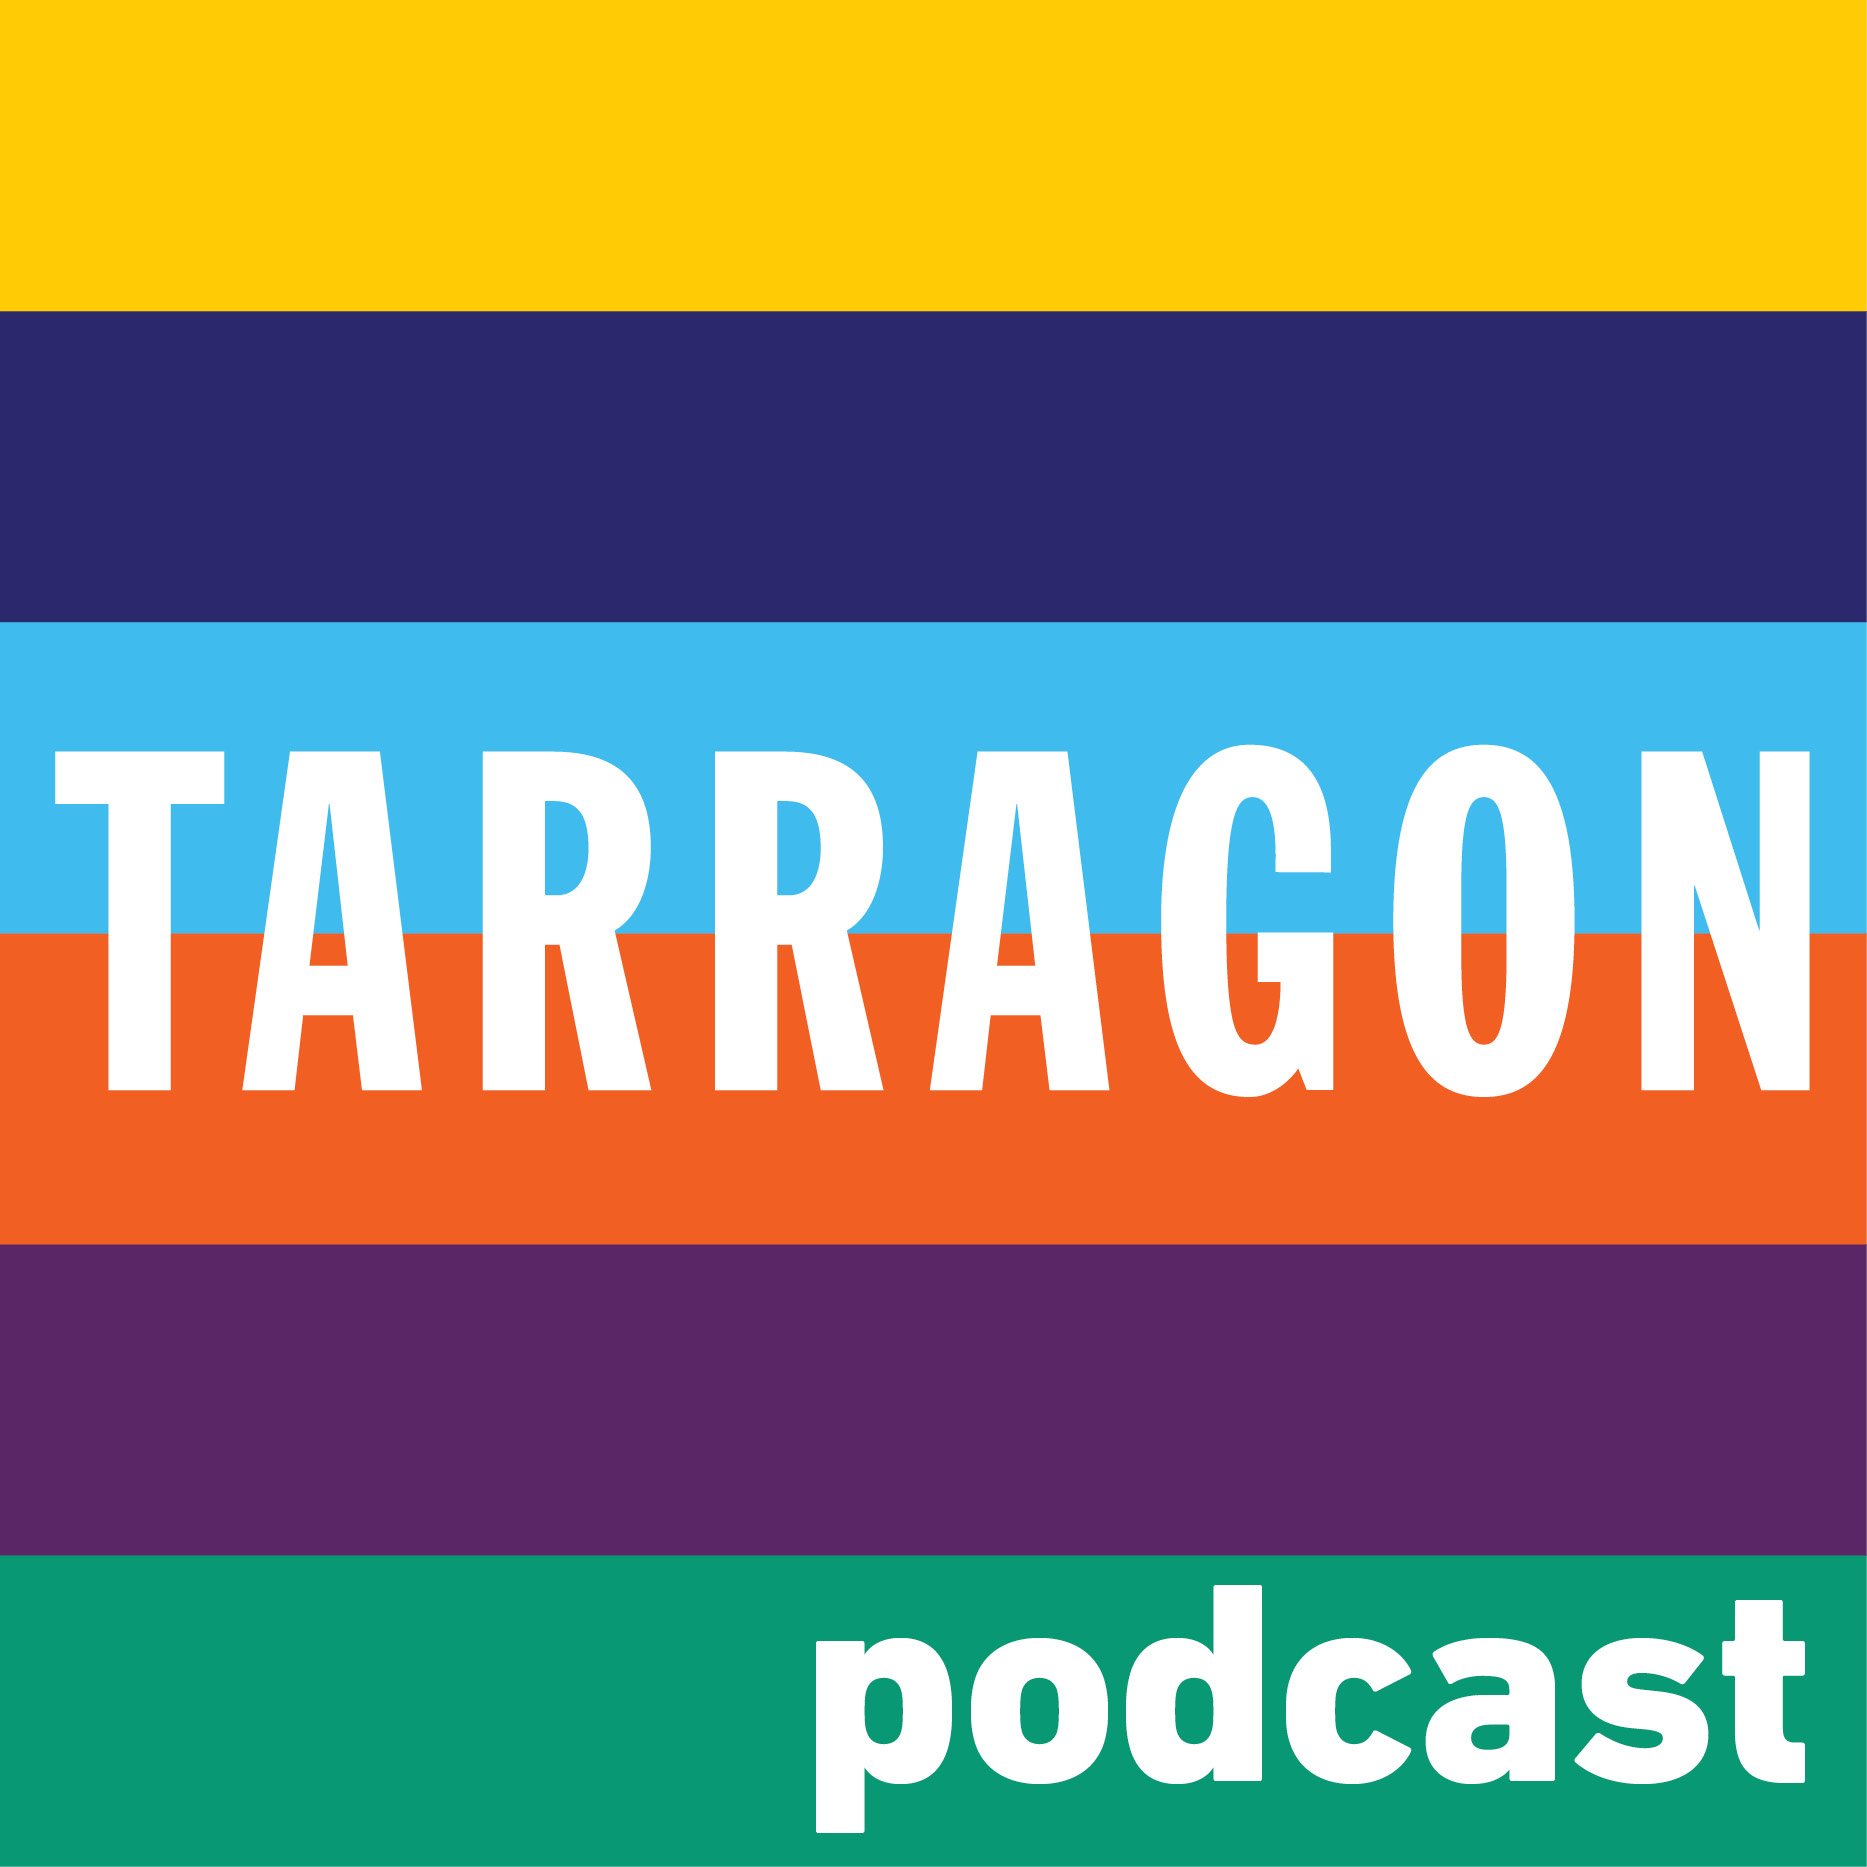 The Tarragon Podcast